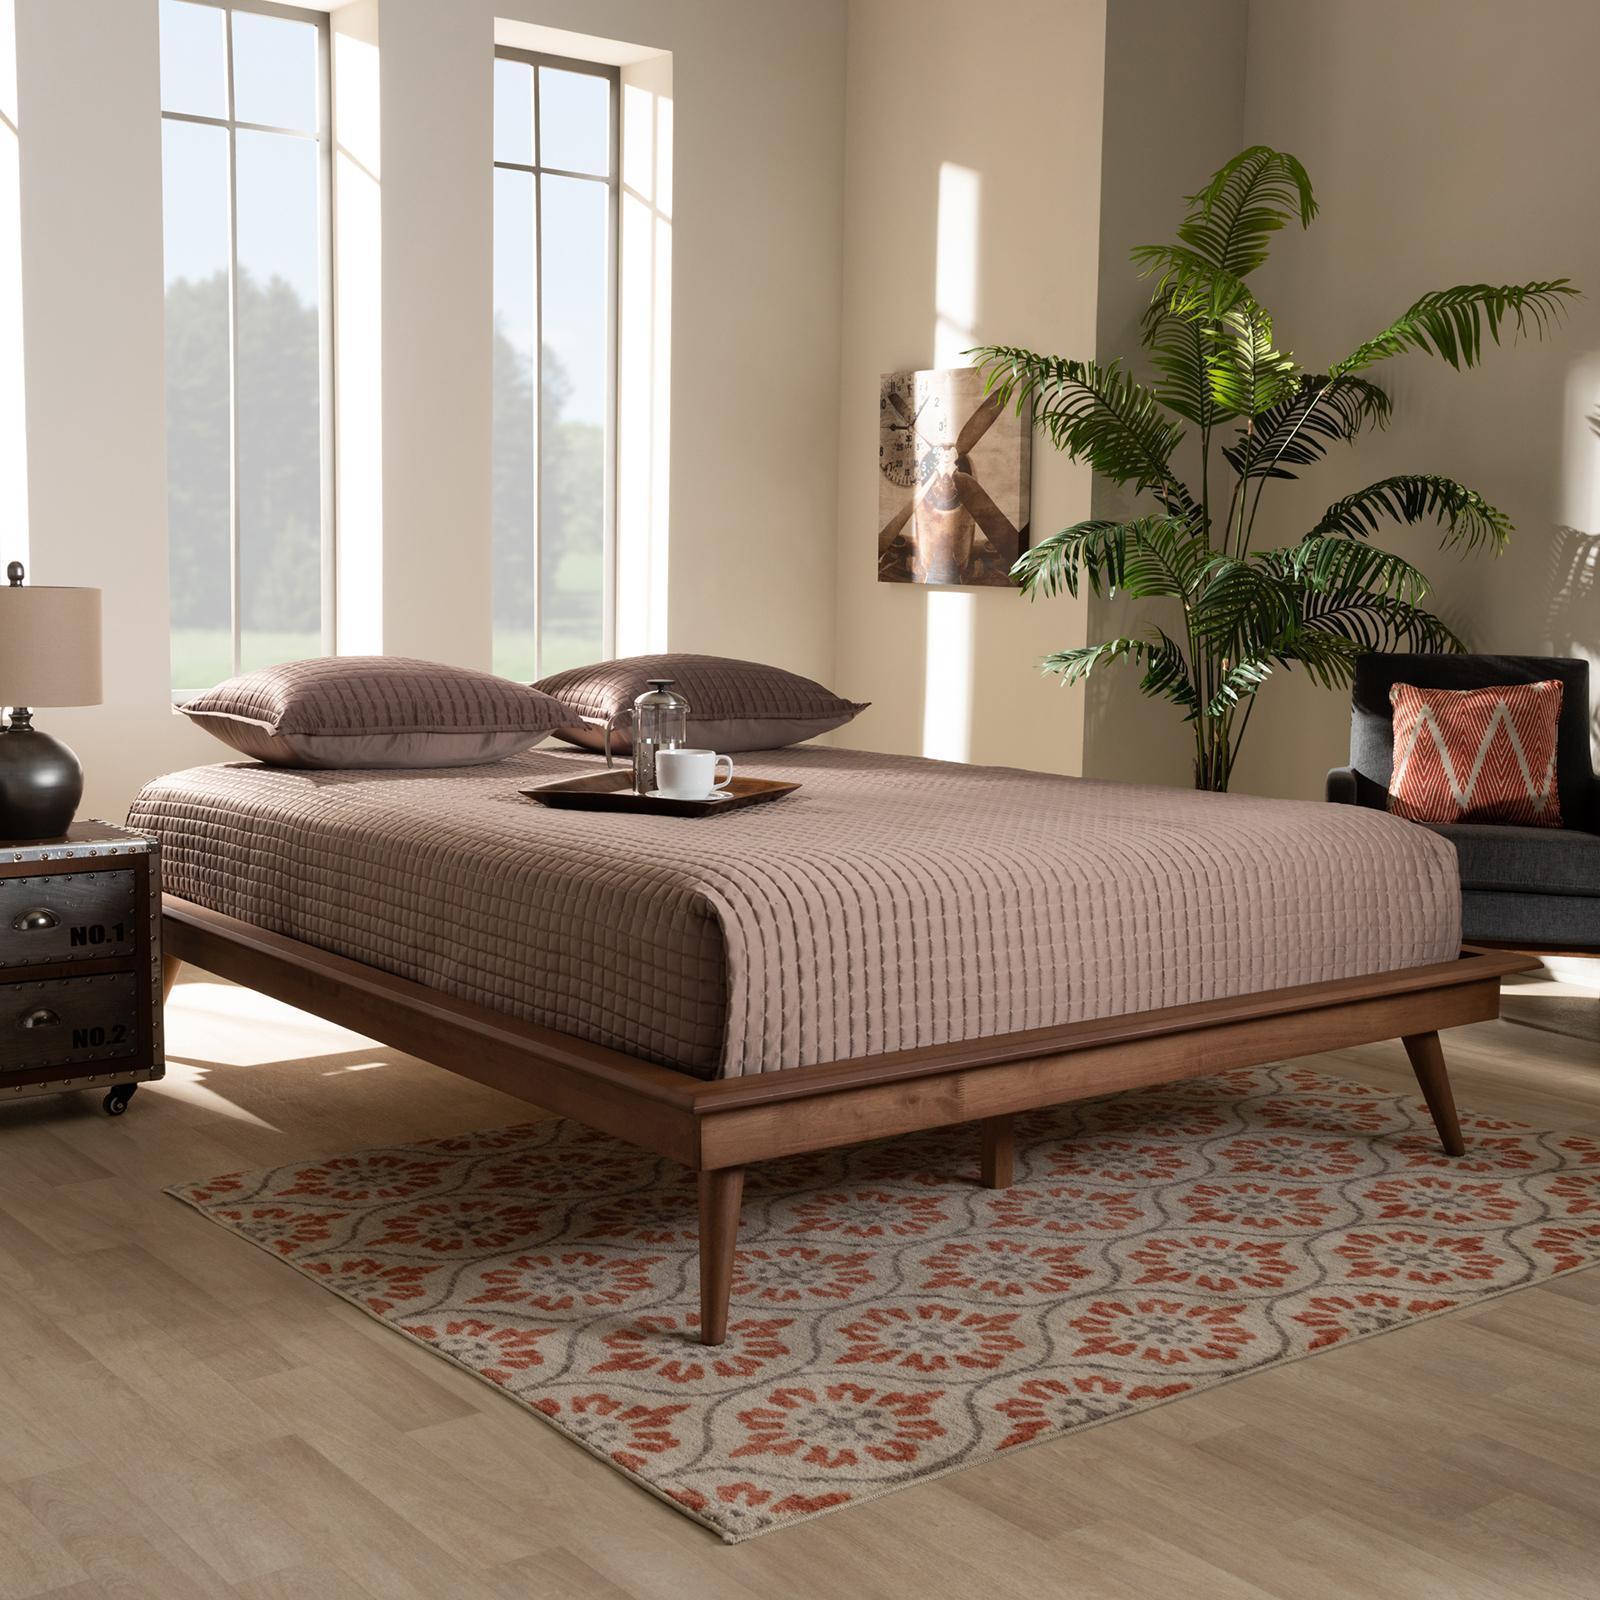 Gold Glass Dining Table, Baxton Studio Karine Mid Century Modern Platform Bed Frame Zola